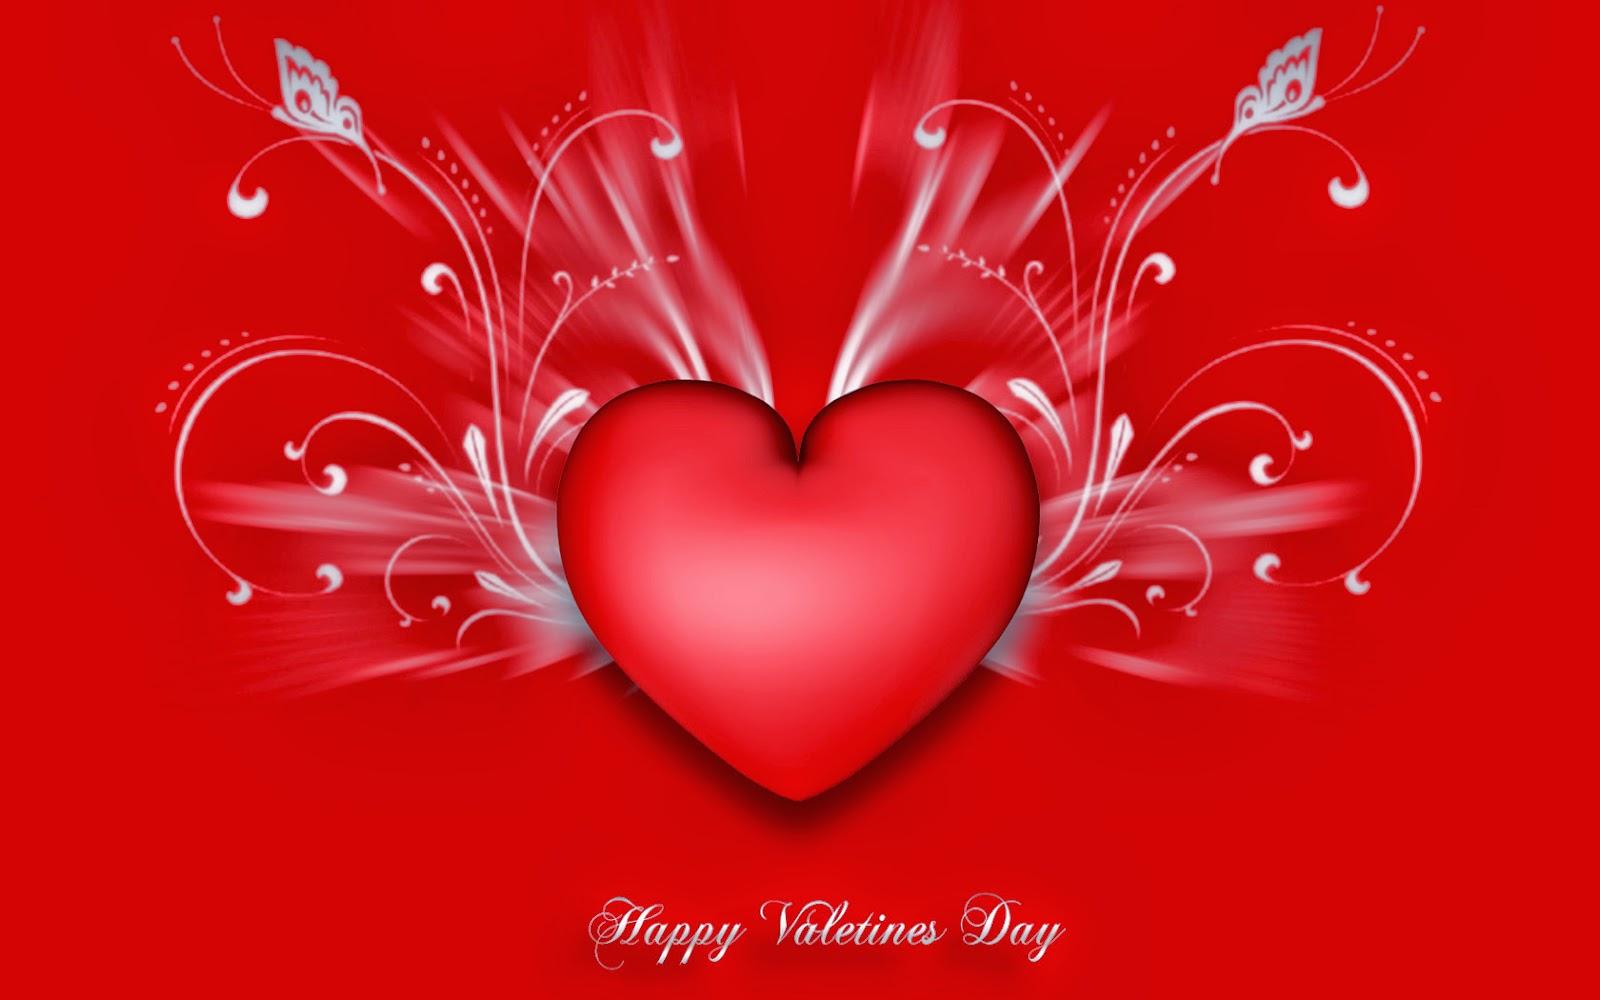 free desktop wallpaper valentines day desktop wallpaper 1600x1000